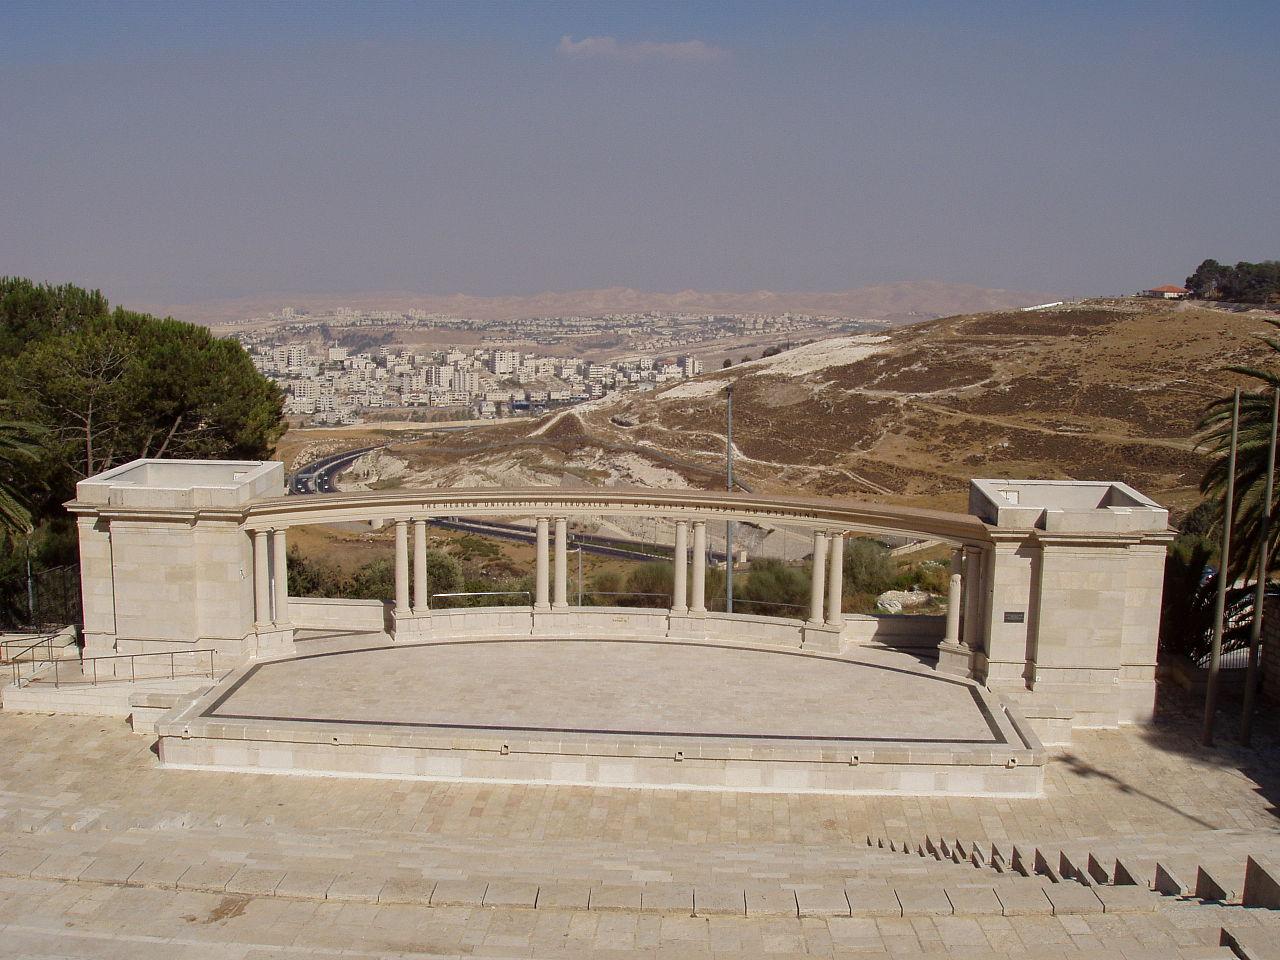 1280px-Amfiteatron-al-shem-Rothberg